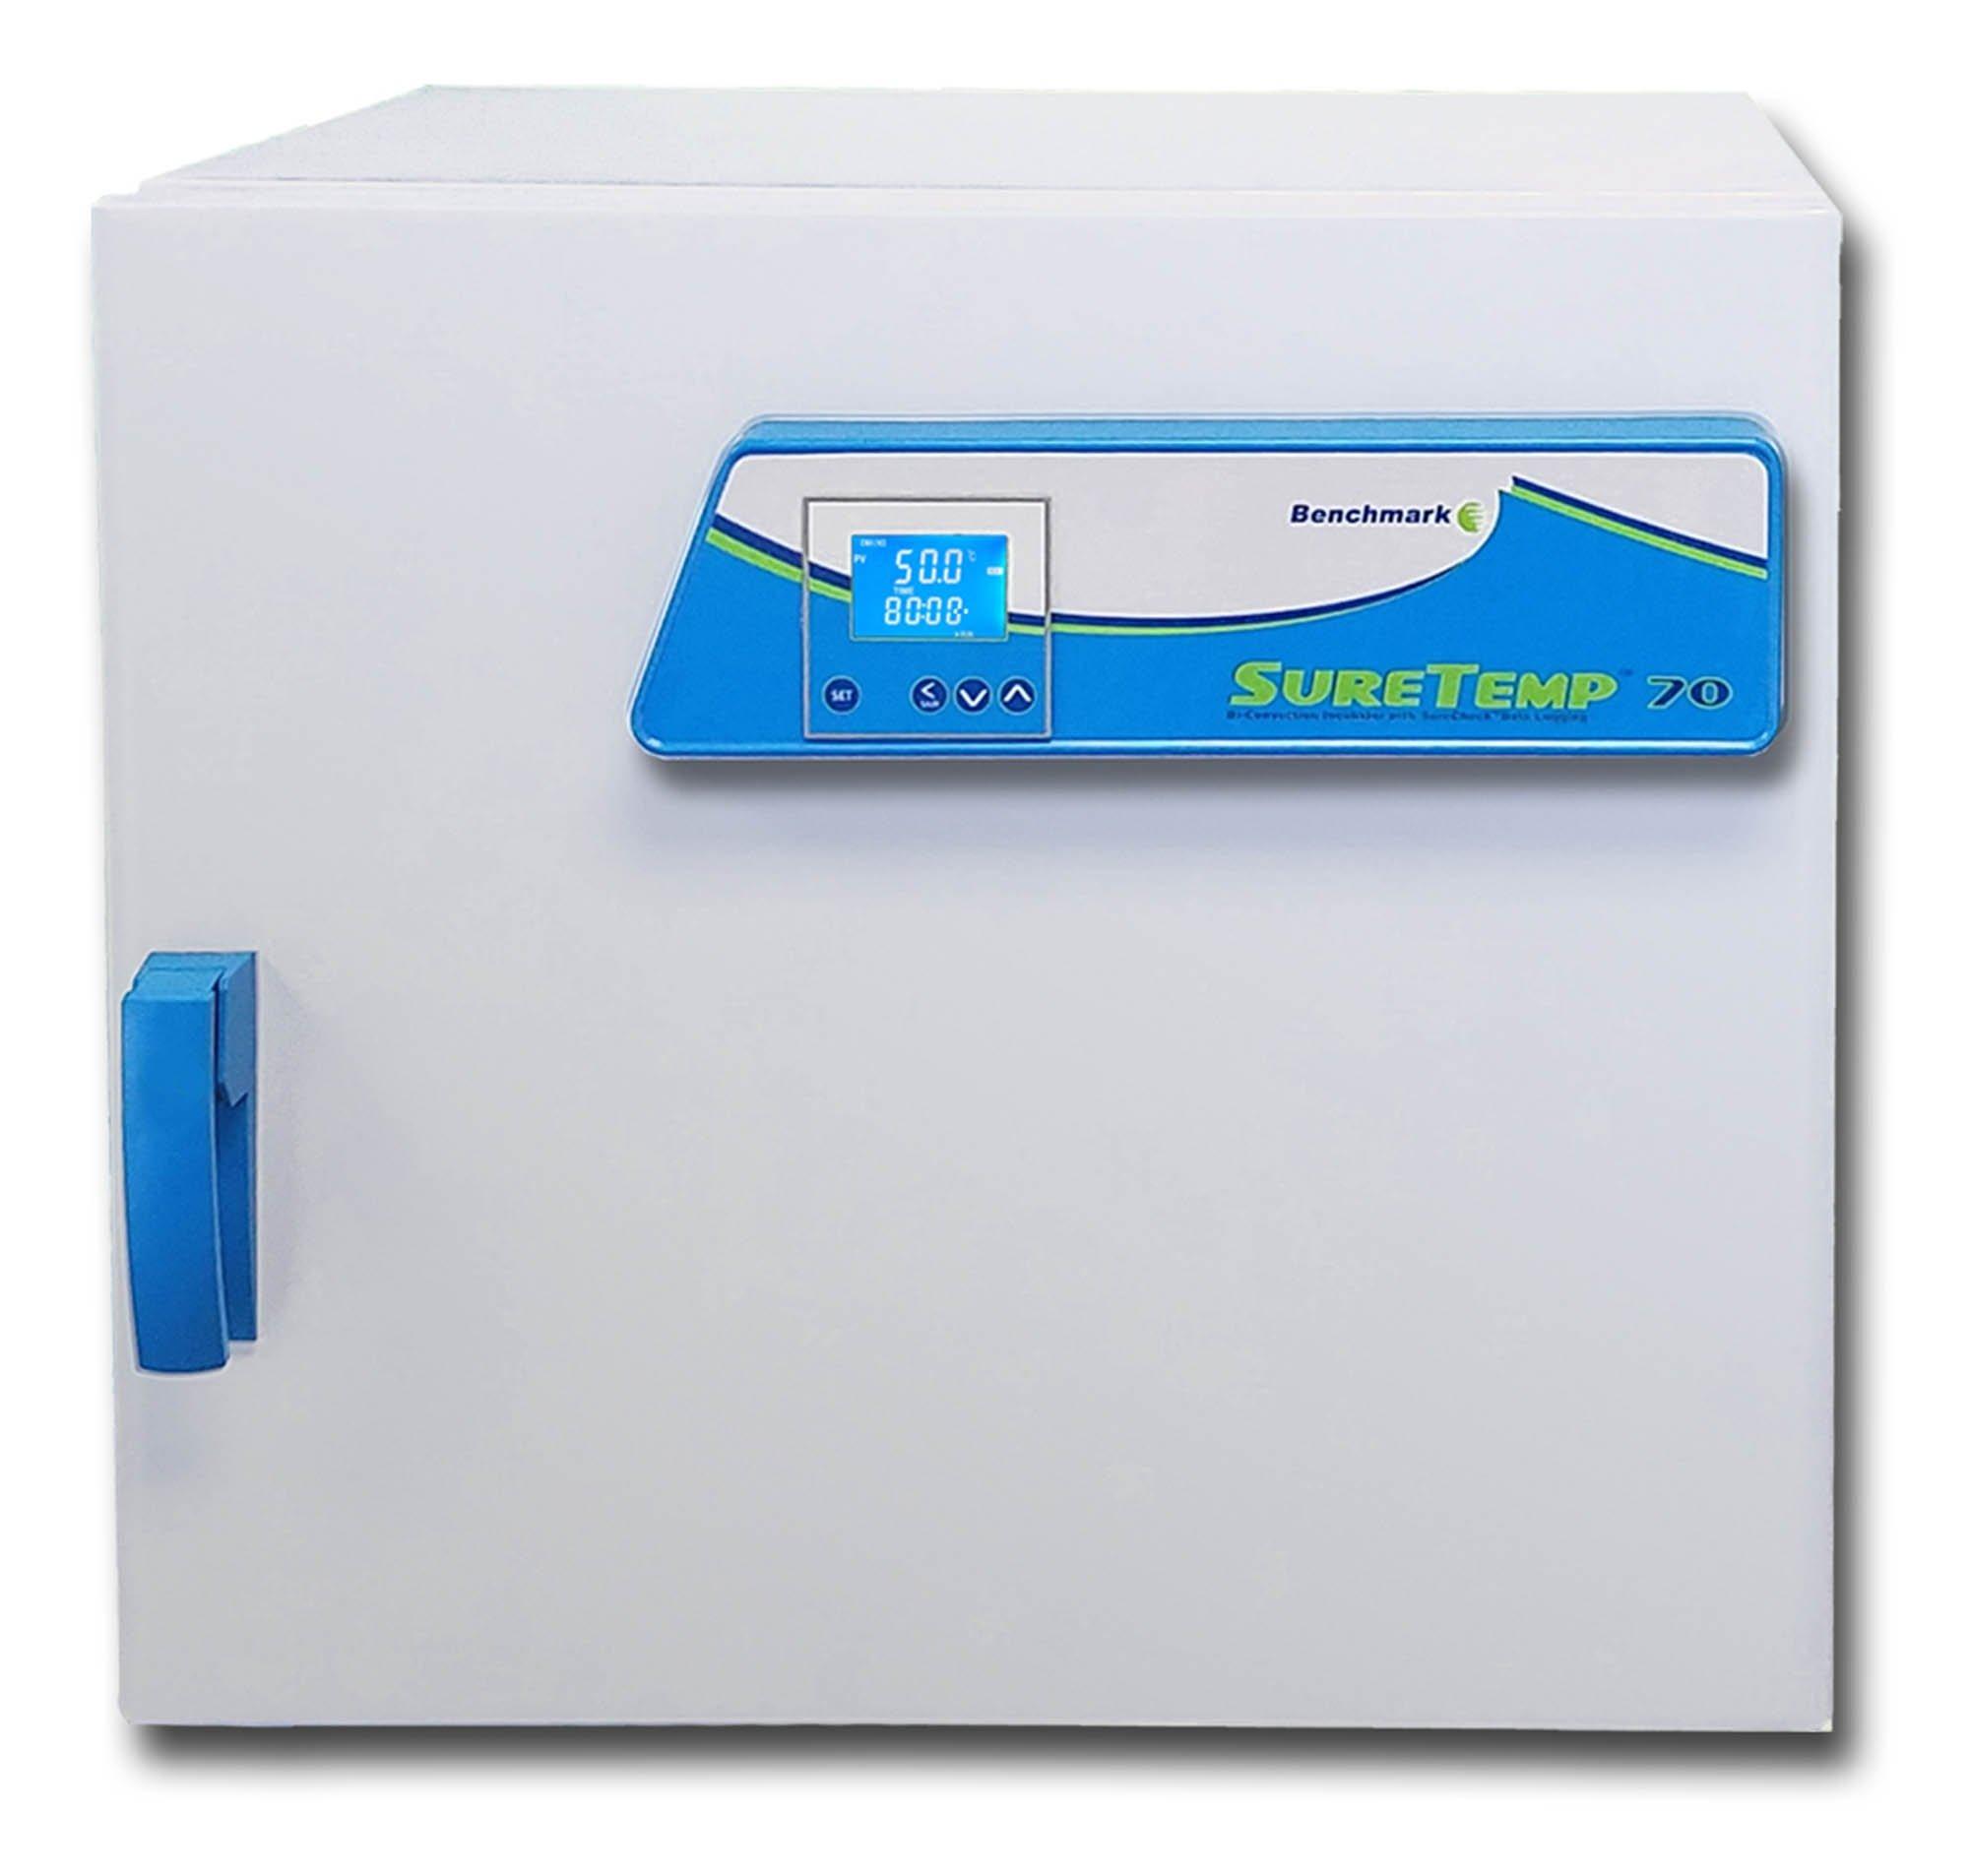 SureTemp Dual Convection Incubator, 70 Liters with SureTemp Data Logging Software (115V)